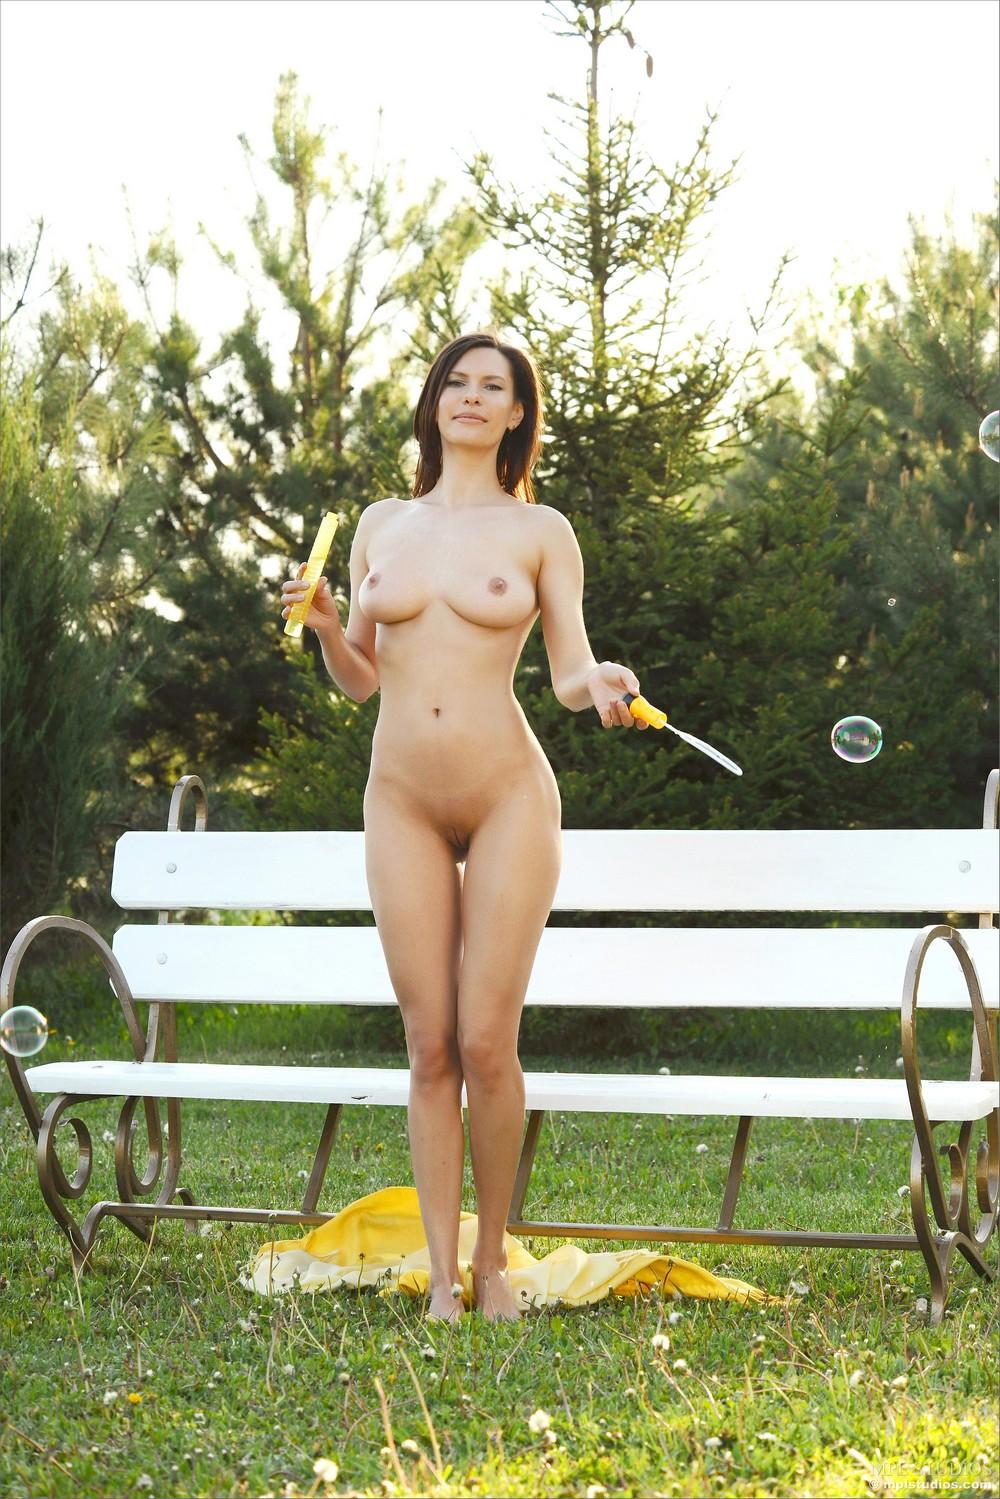 Обнаженная Сюзанна пускает мыльные пузыри